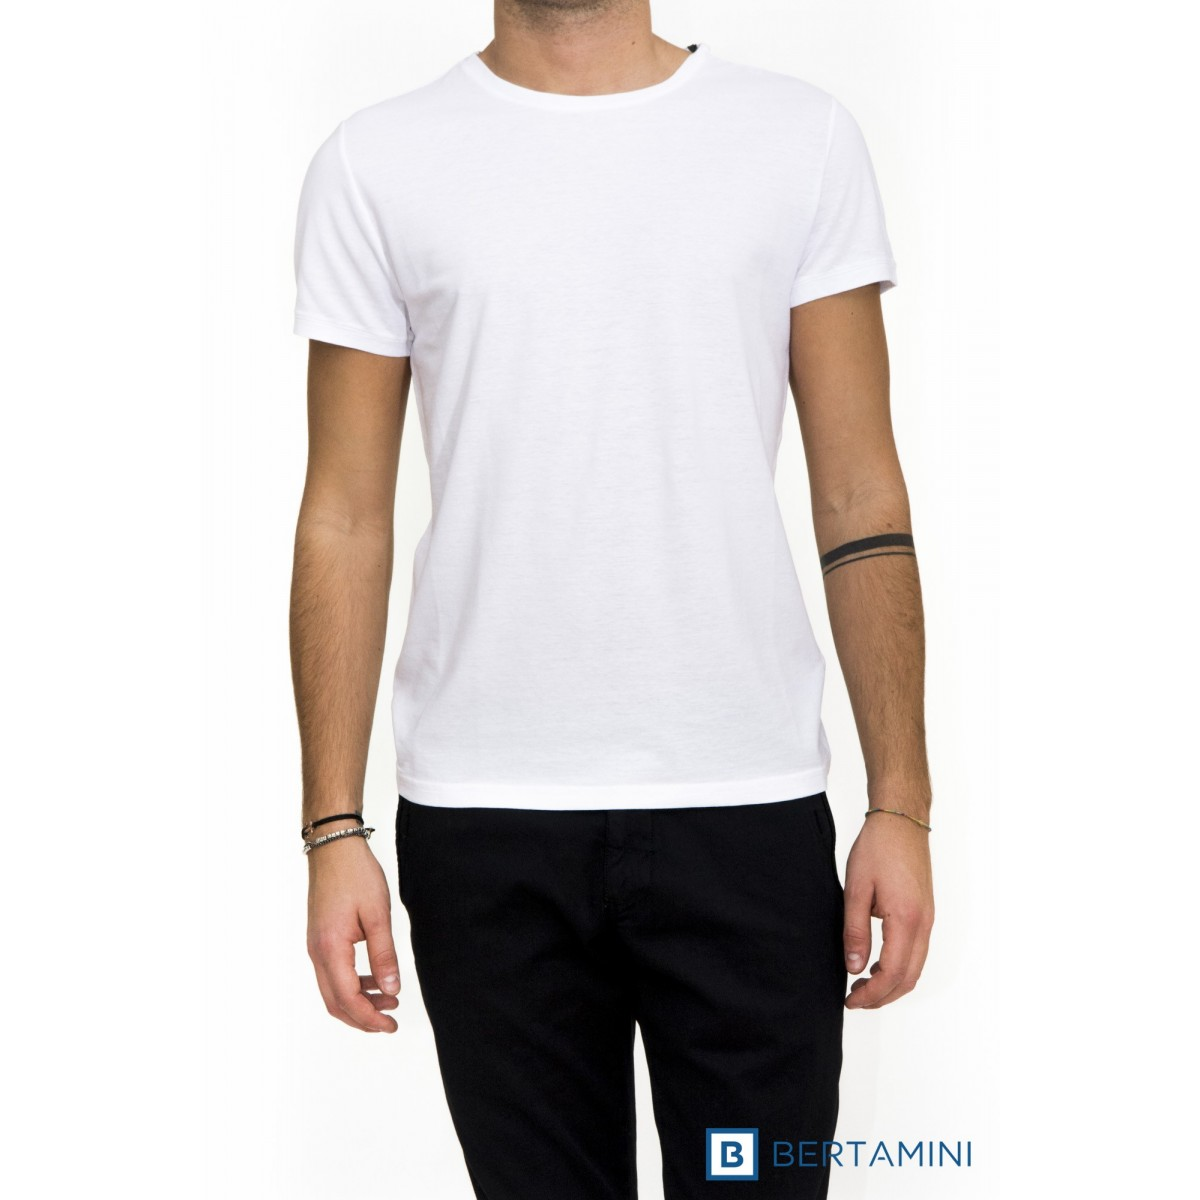 T-shirt uomo Kangra - 1408/21 t-shirt cotone crep